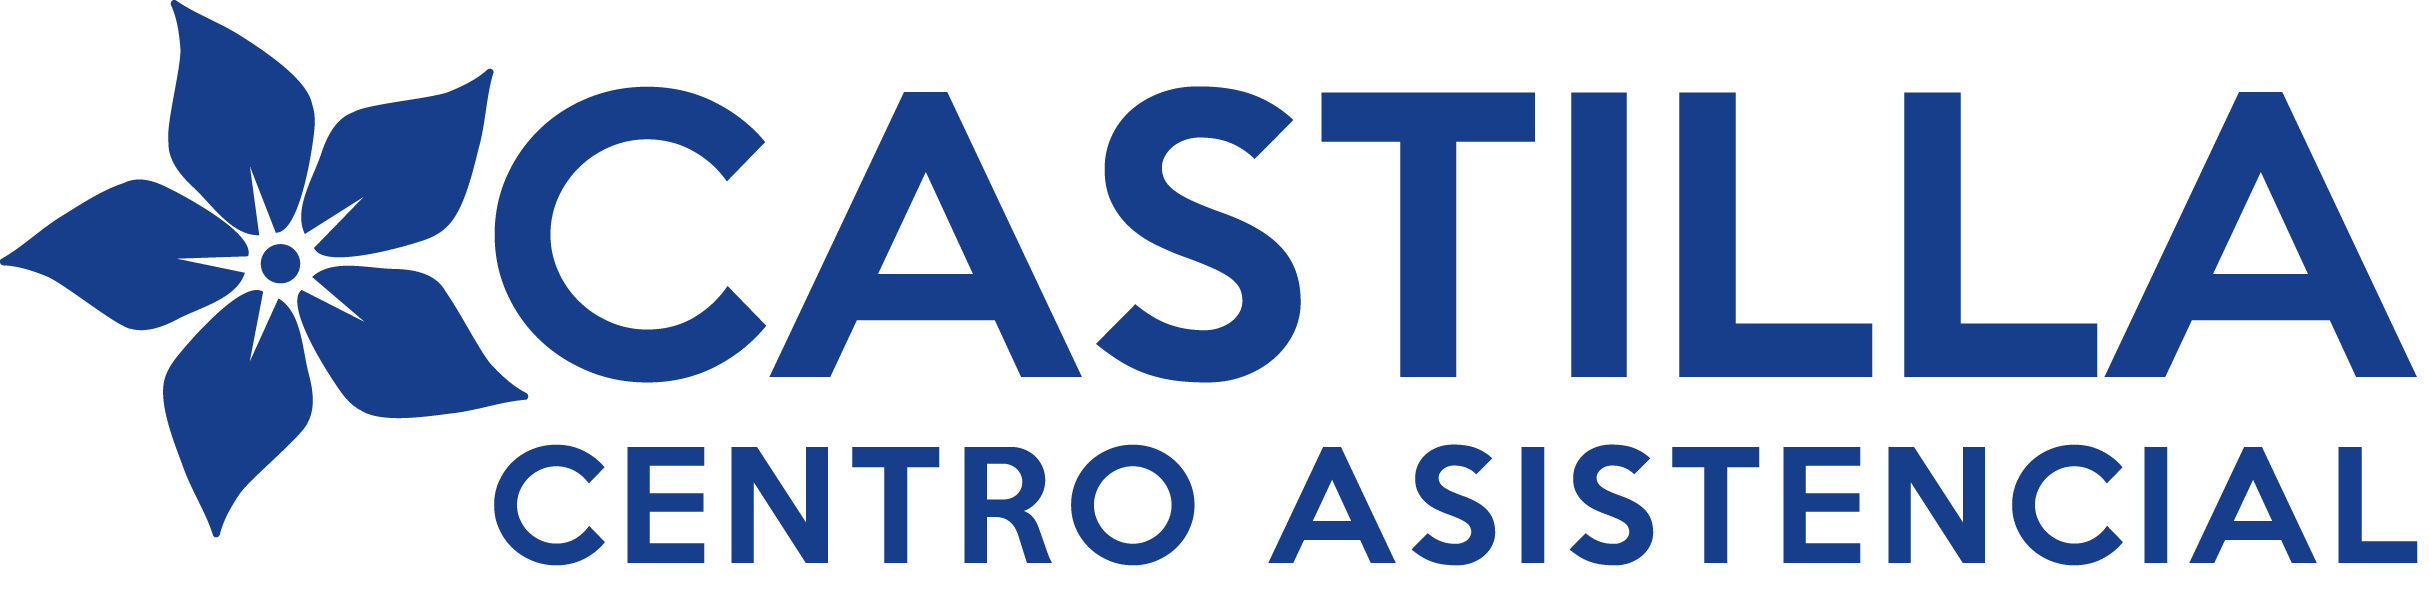 Centro Asistencial Castilla